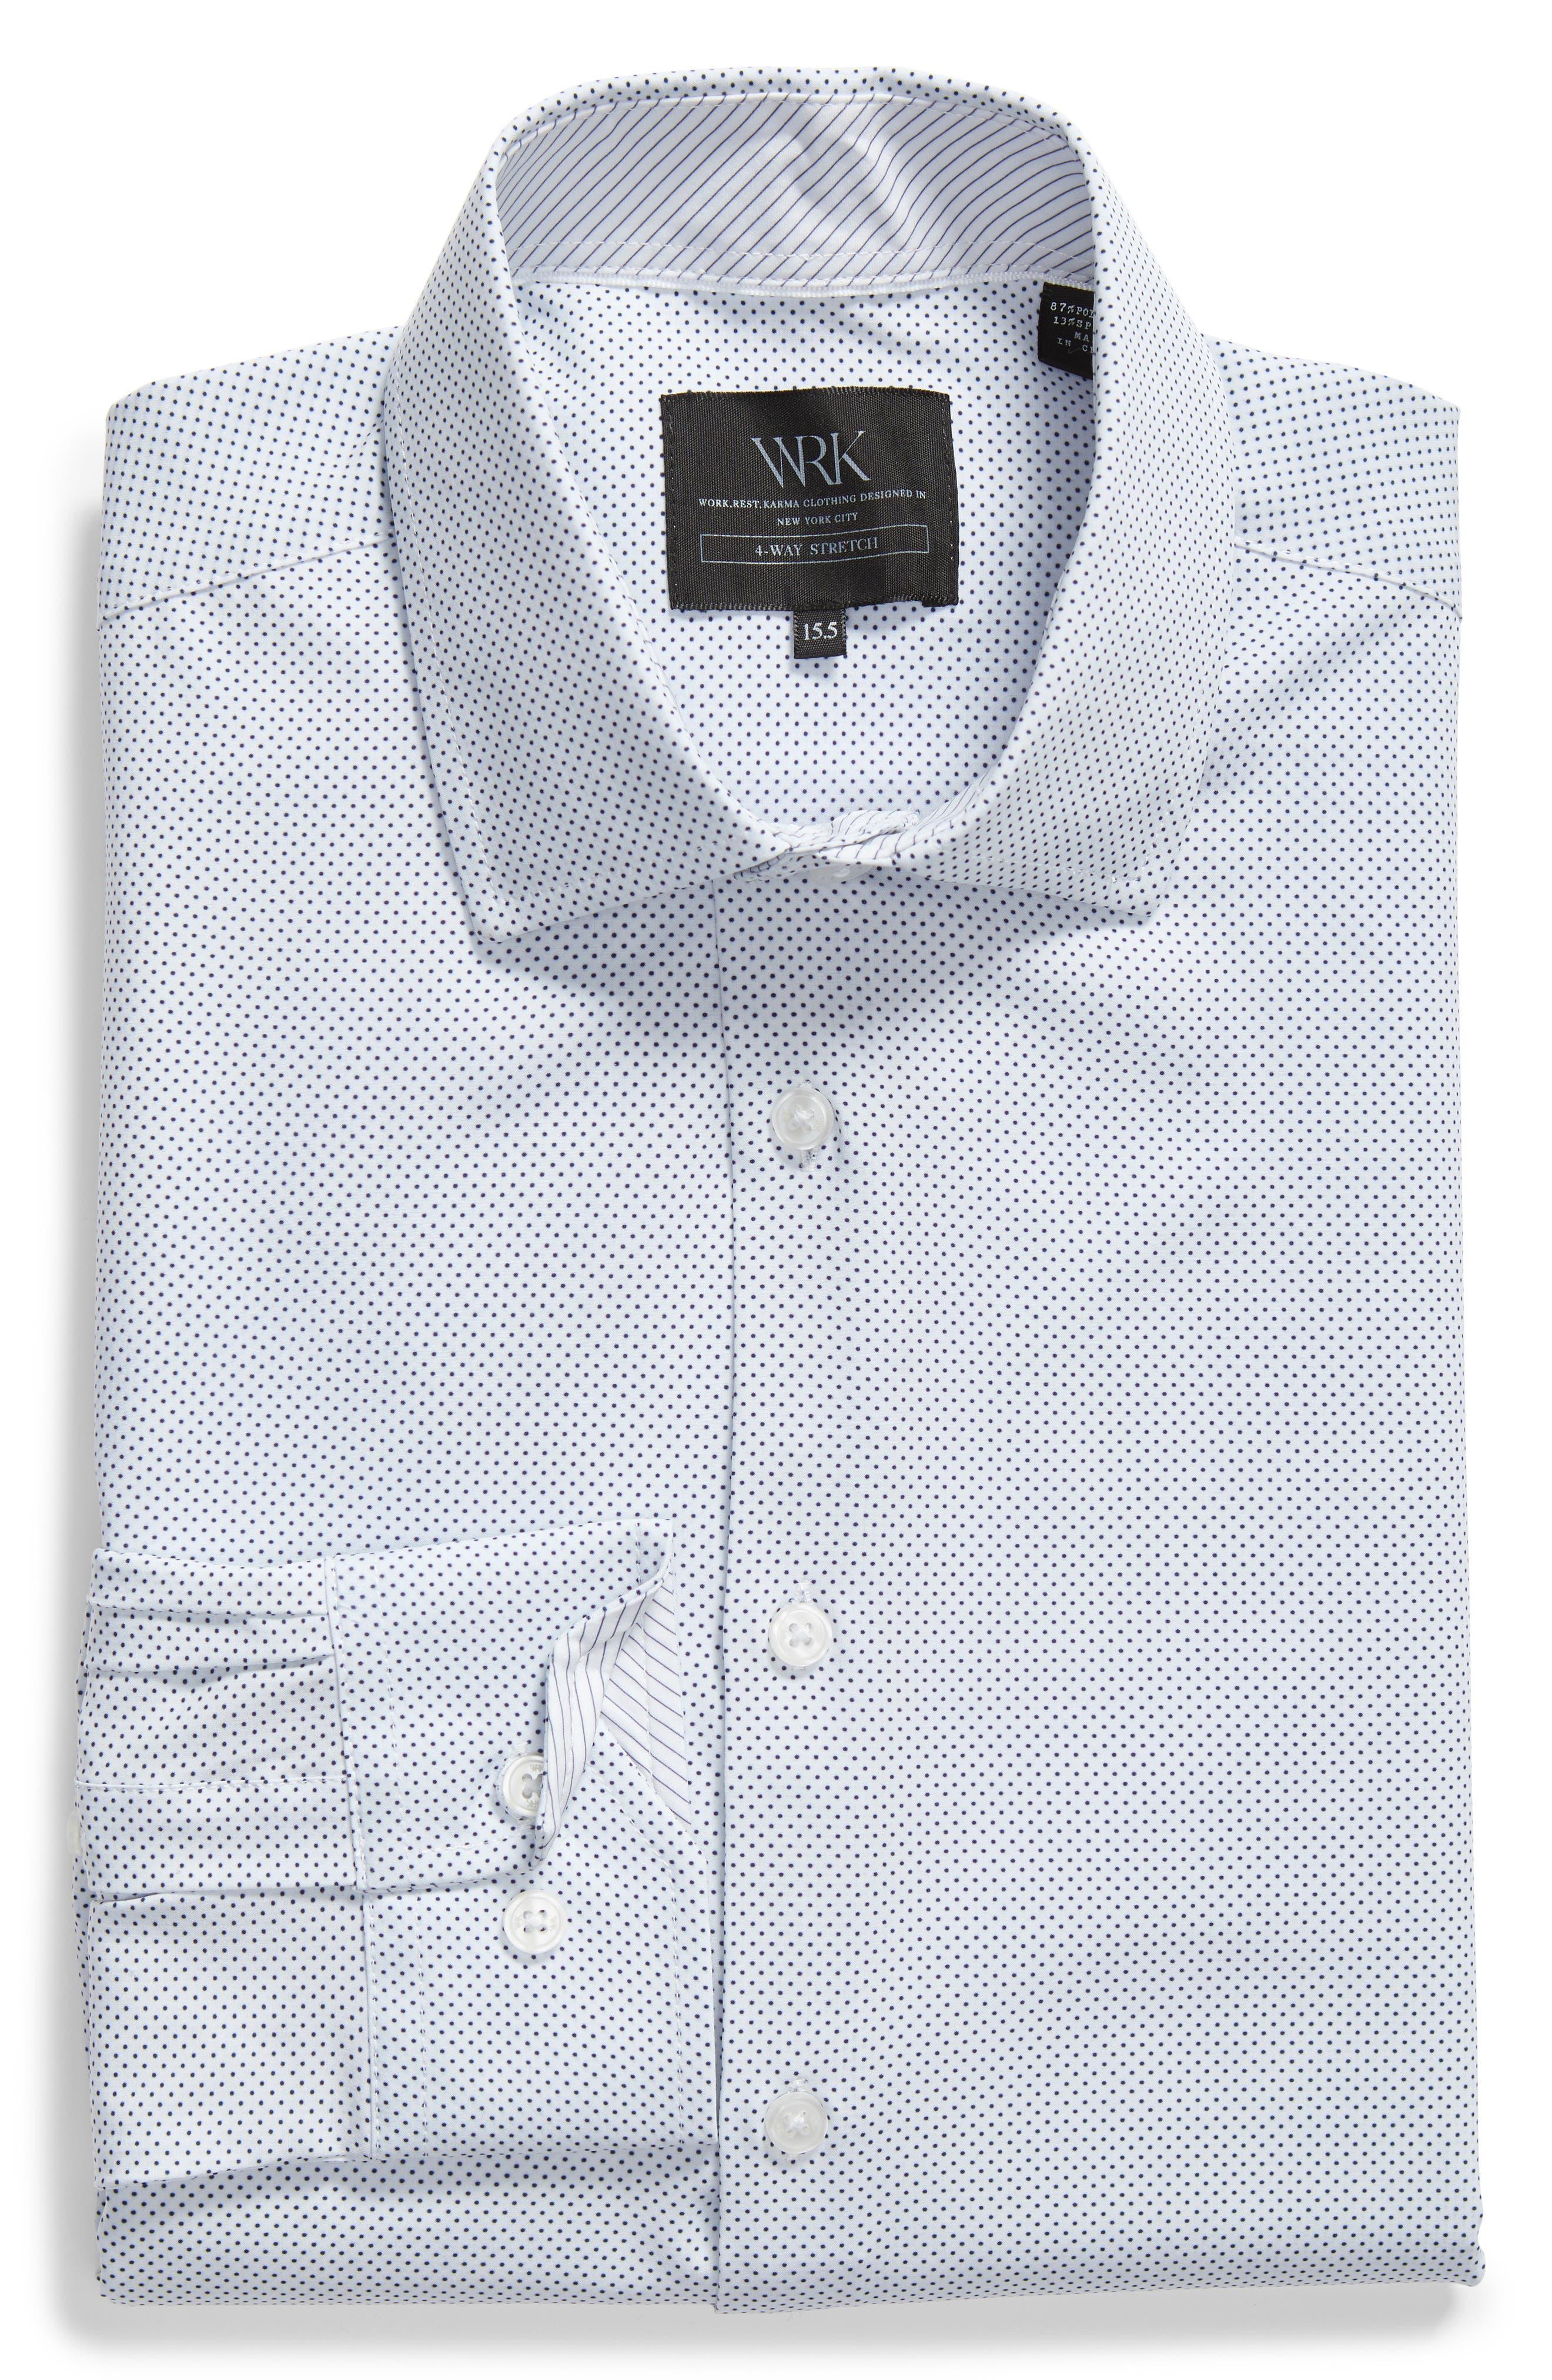 W.R.K,                             Trim Fit Dot 4-Way Stretch Dress Shirt,                             Alternate thumbnail 5, color,                             100